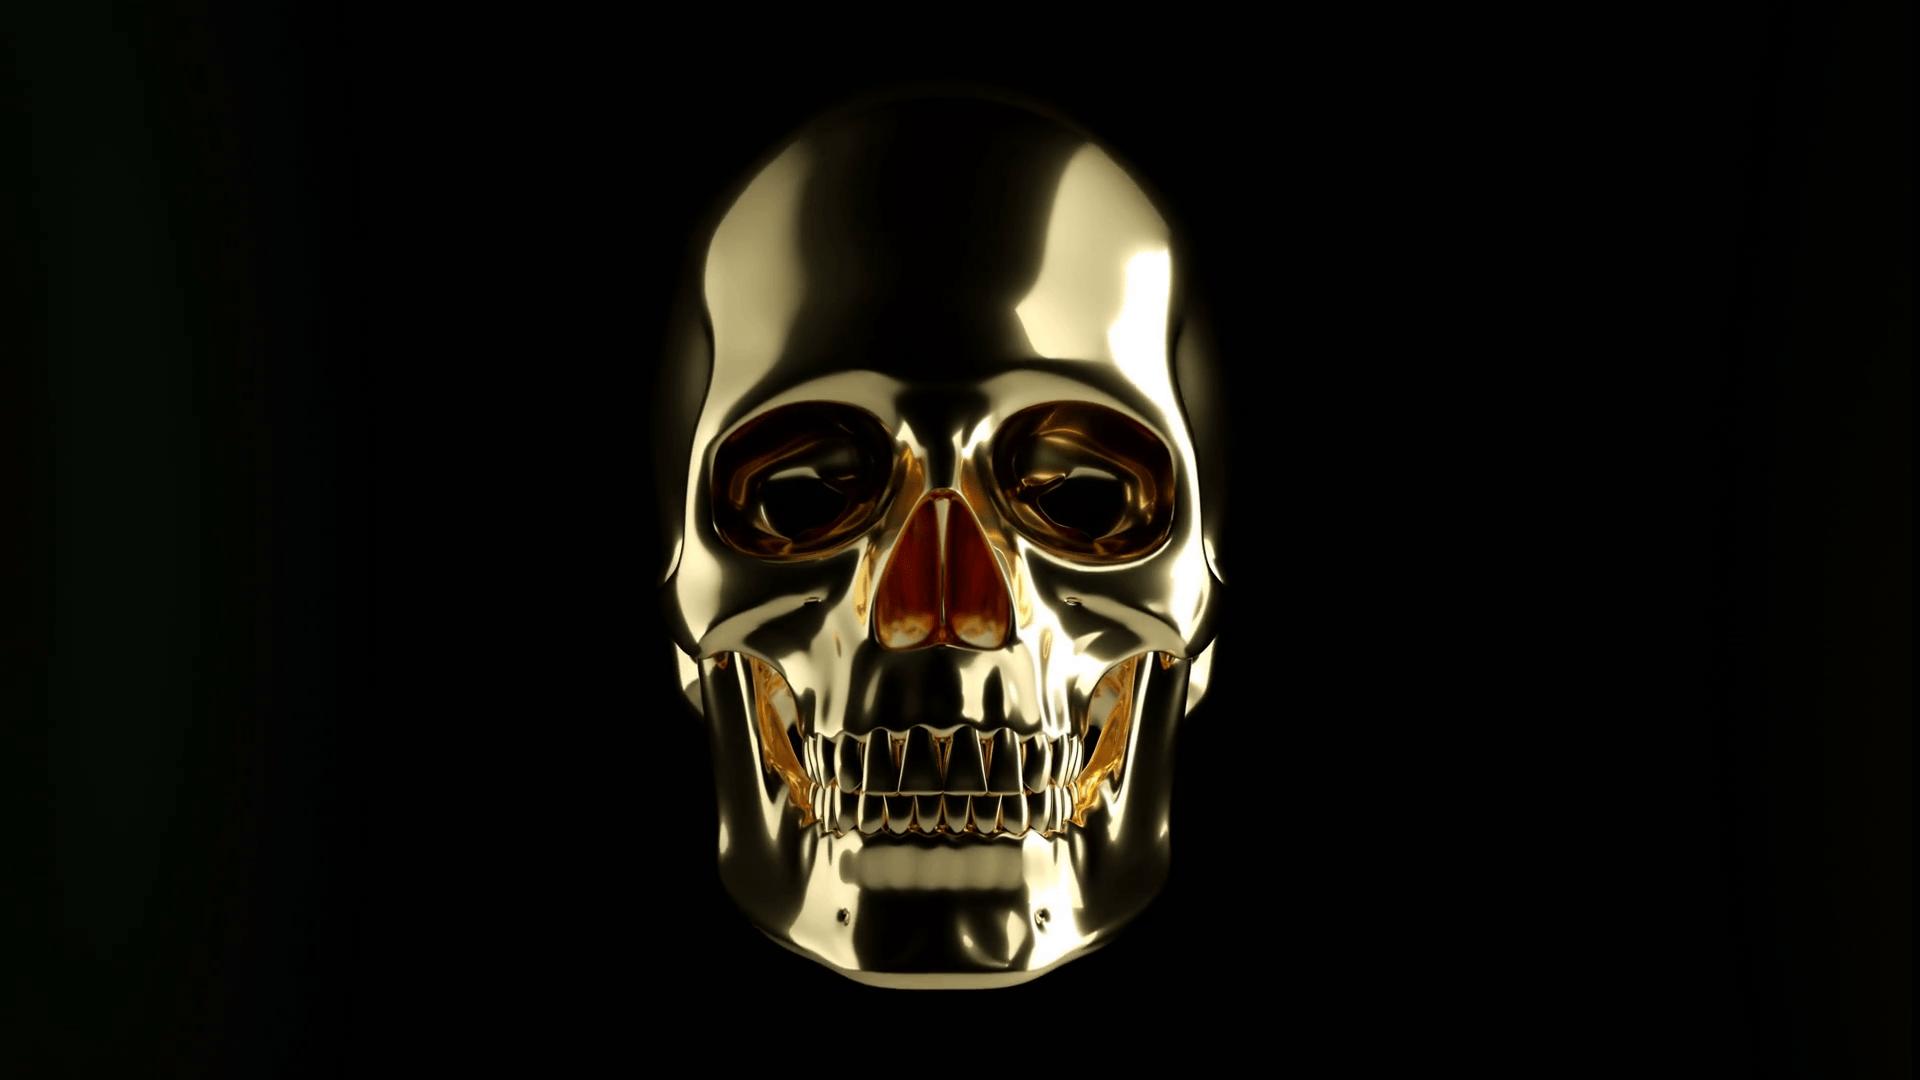 Metallic Skull Wallpapers on WallpaperDog